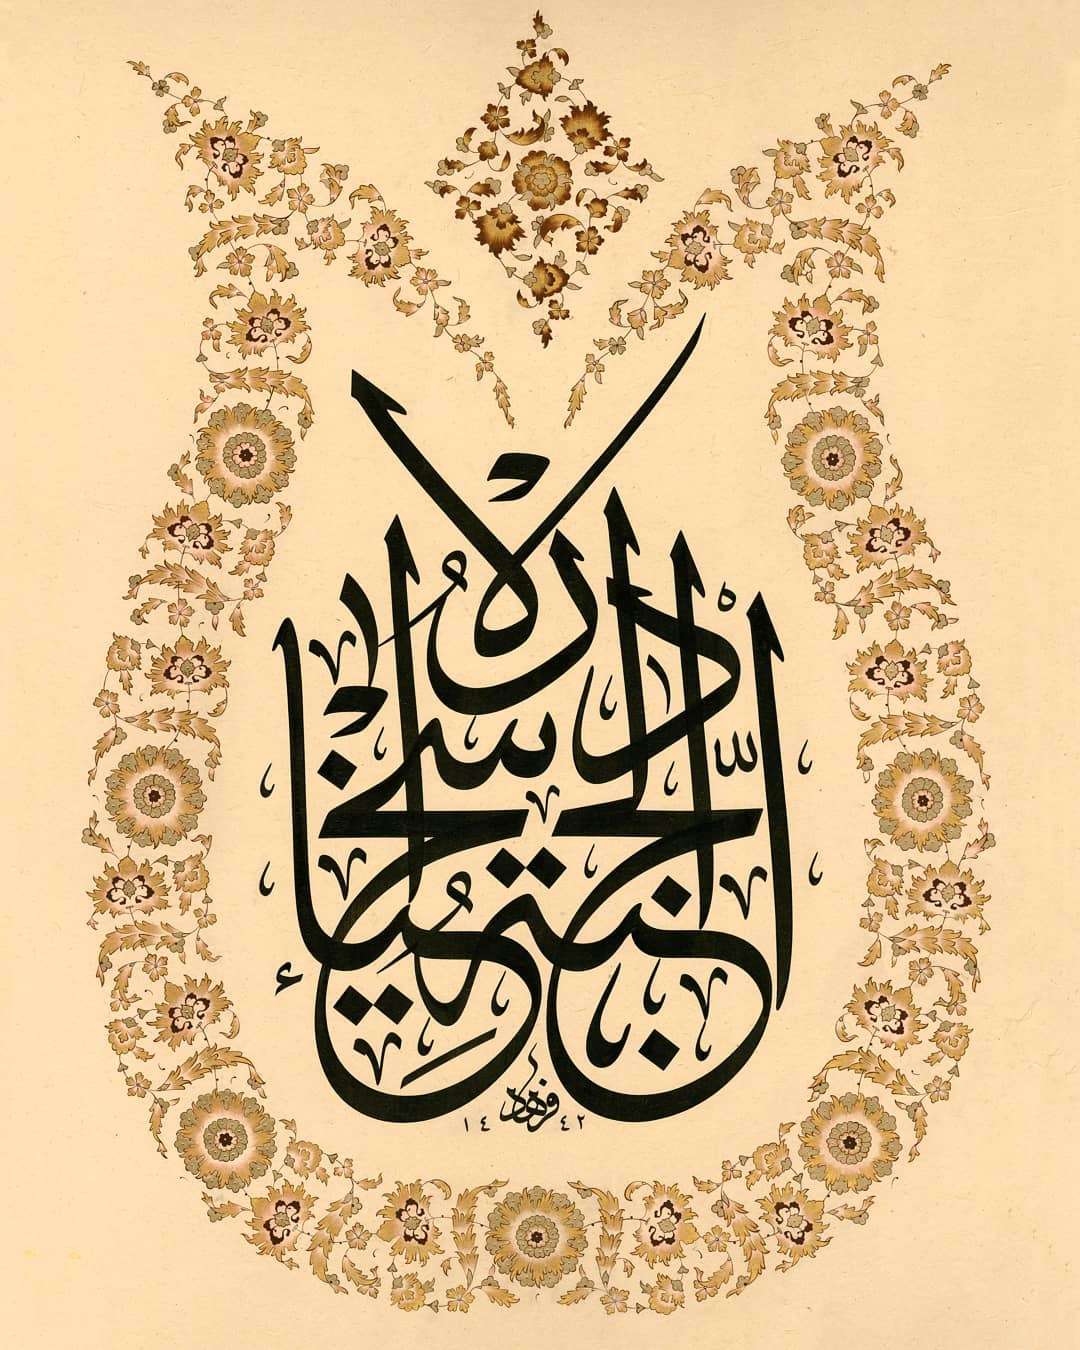 Karya Kaligrafi Peygamber efendimiz buyurmuş:Cennet cömertler yurdudur. الجنة دار الاسخياء Tezhi…- Ferhat Kurlu